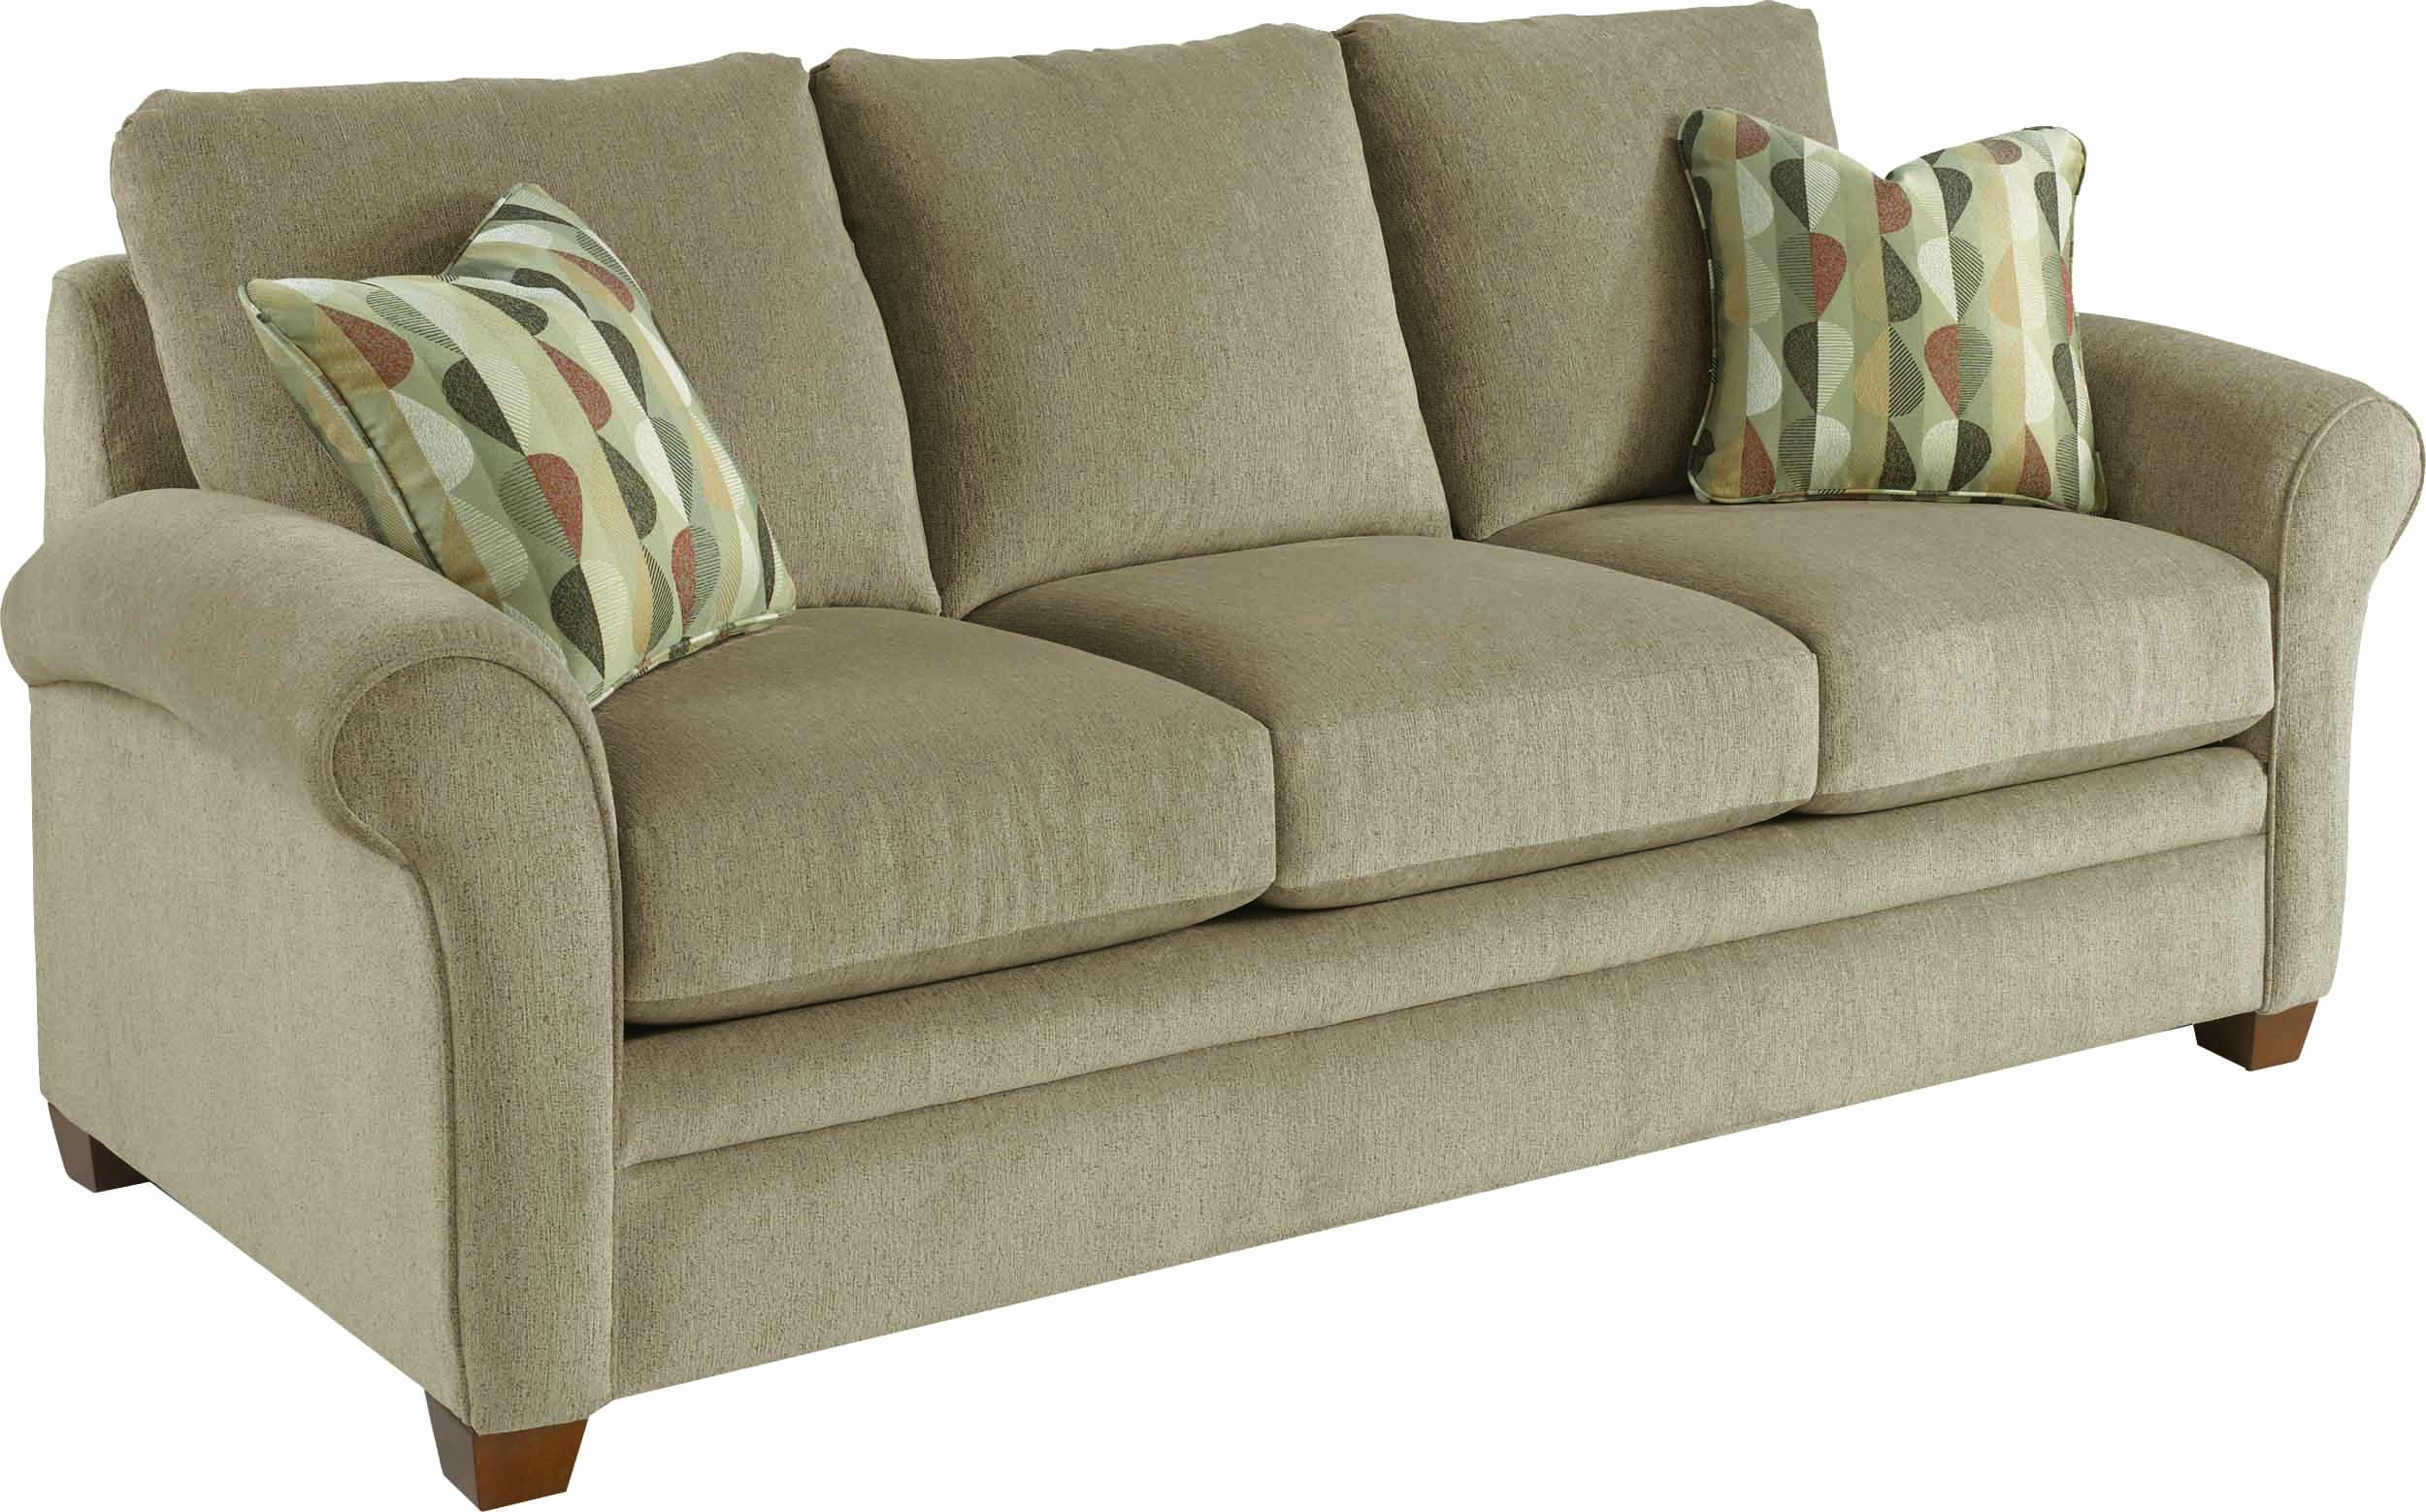 Pin By Great Sofas On Sleeper Sofa Loveseat Sleeper Sofa